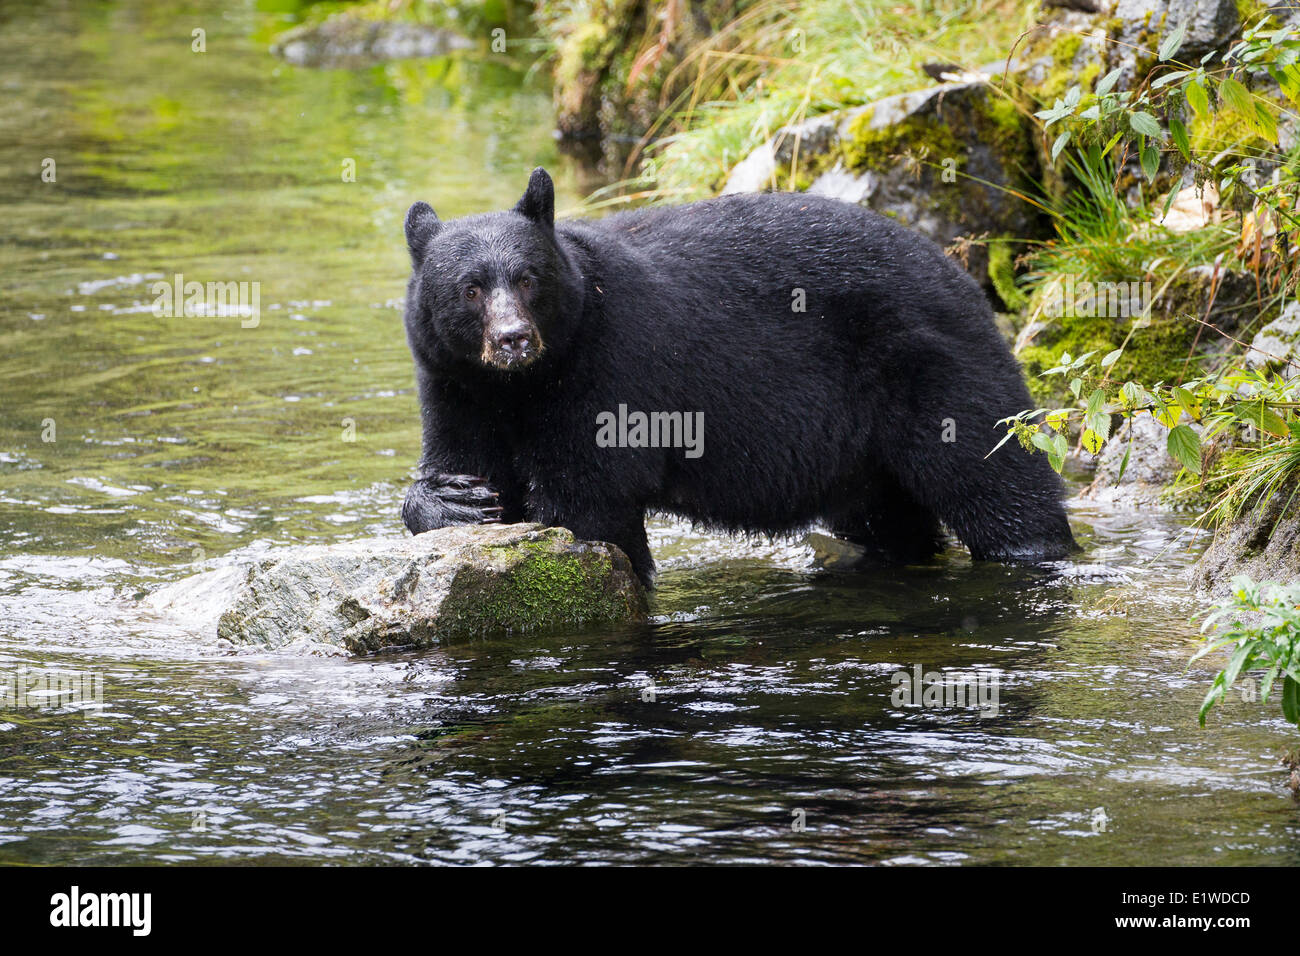 Black Bear Fishing Stock Photos Amp Black Bear Fishing Stock Images